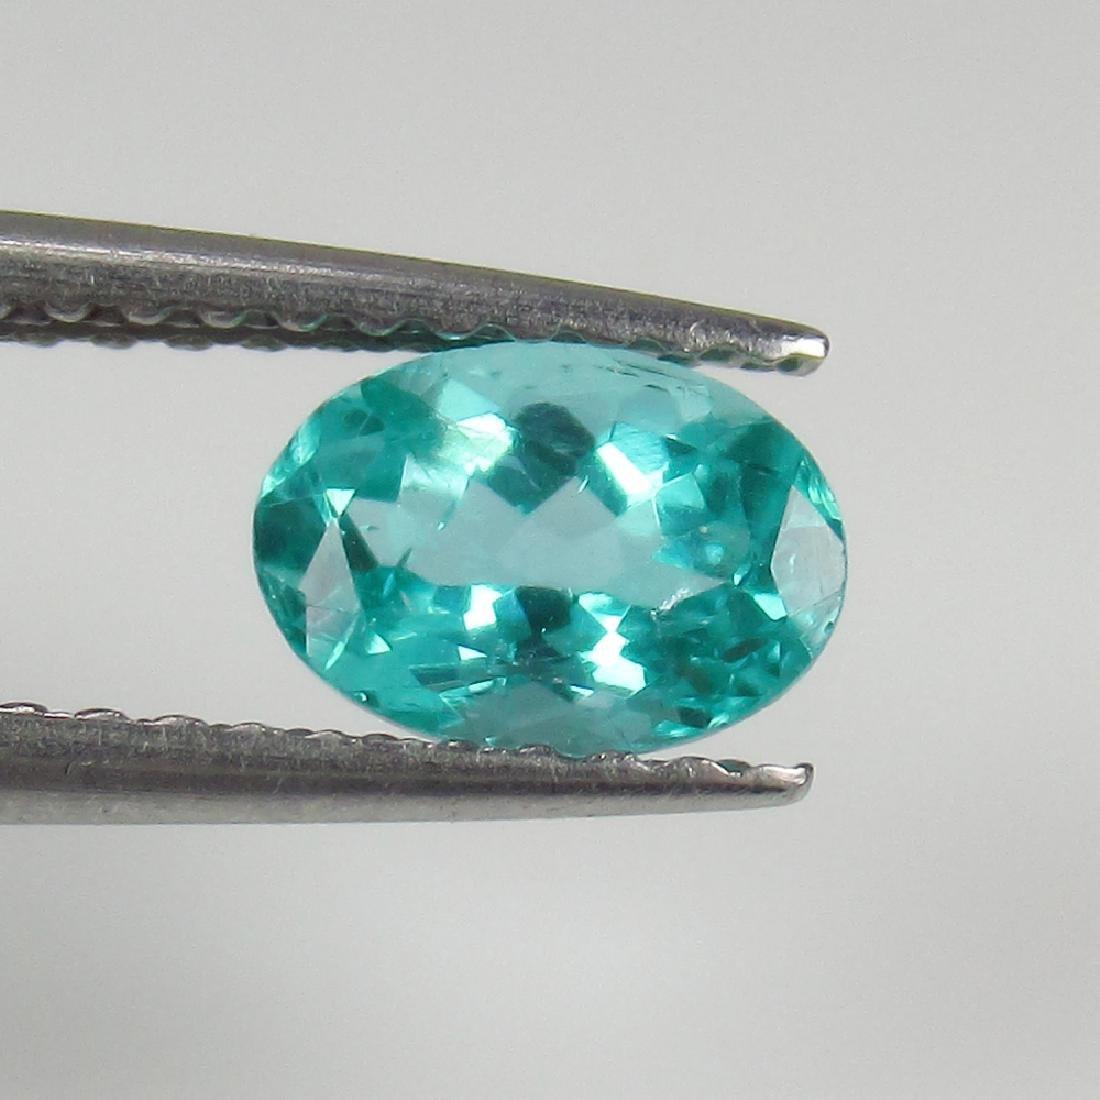 0.70 Ctw Natural Bluish Green Apatite Oval Cut